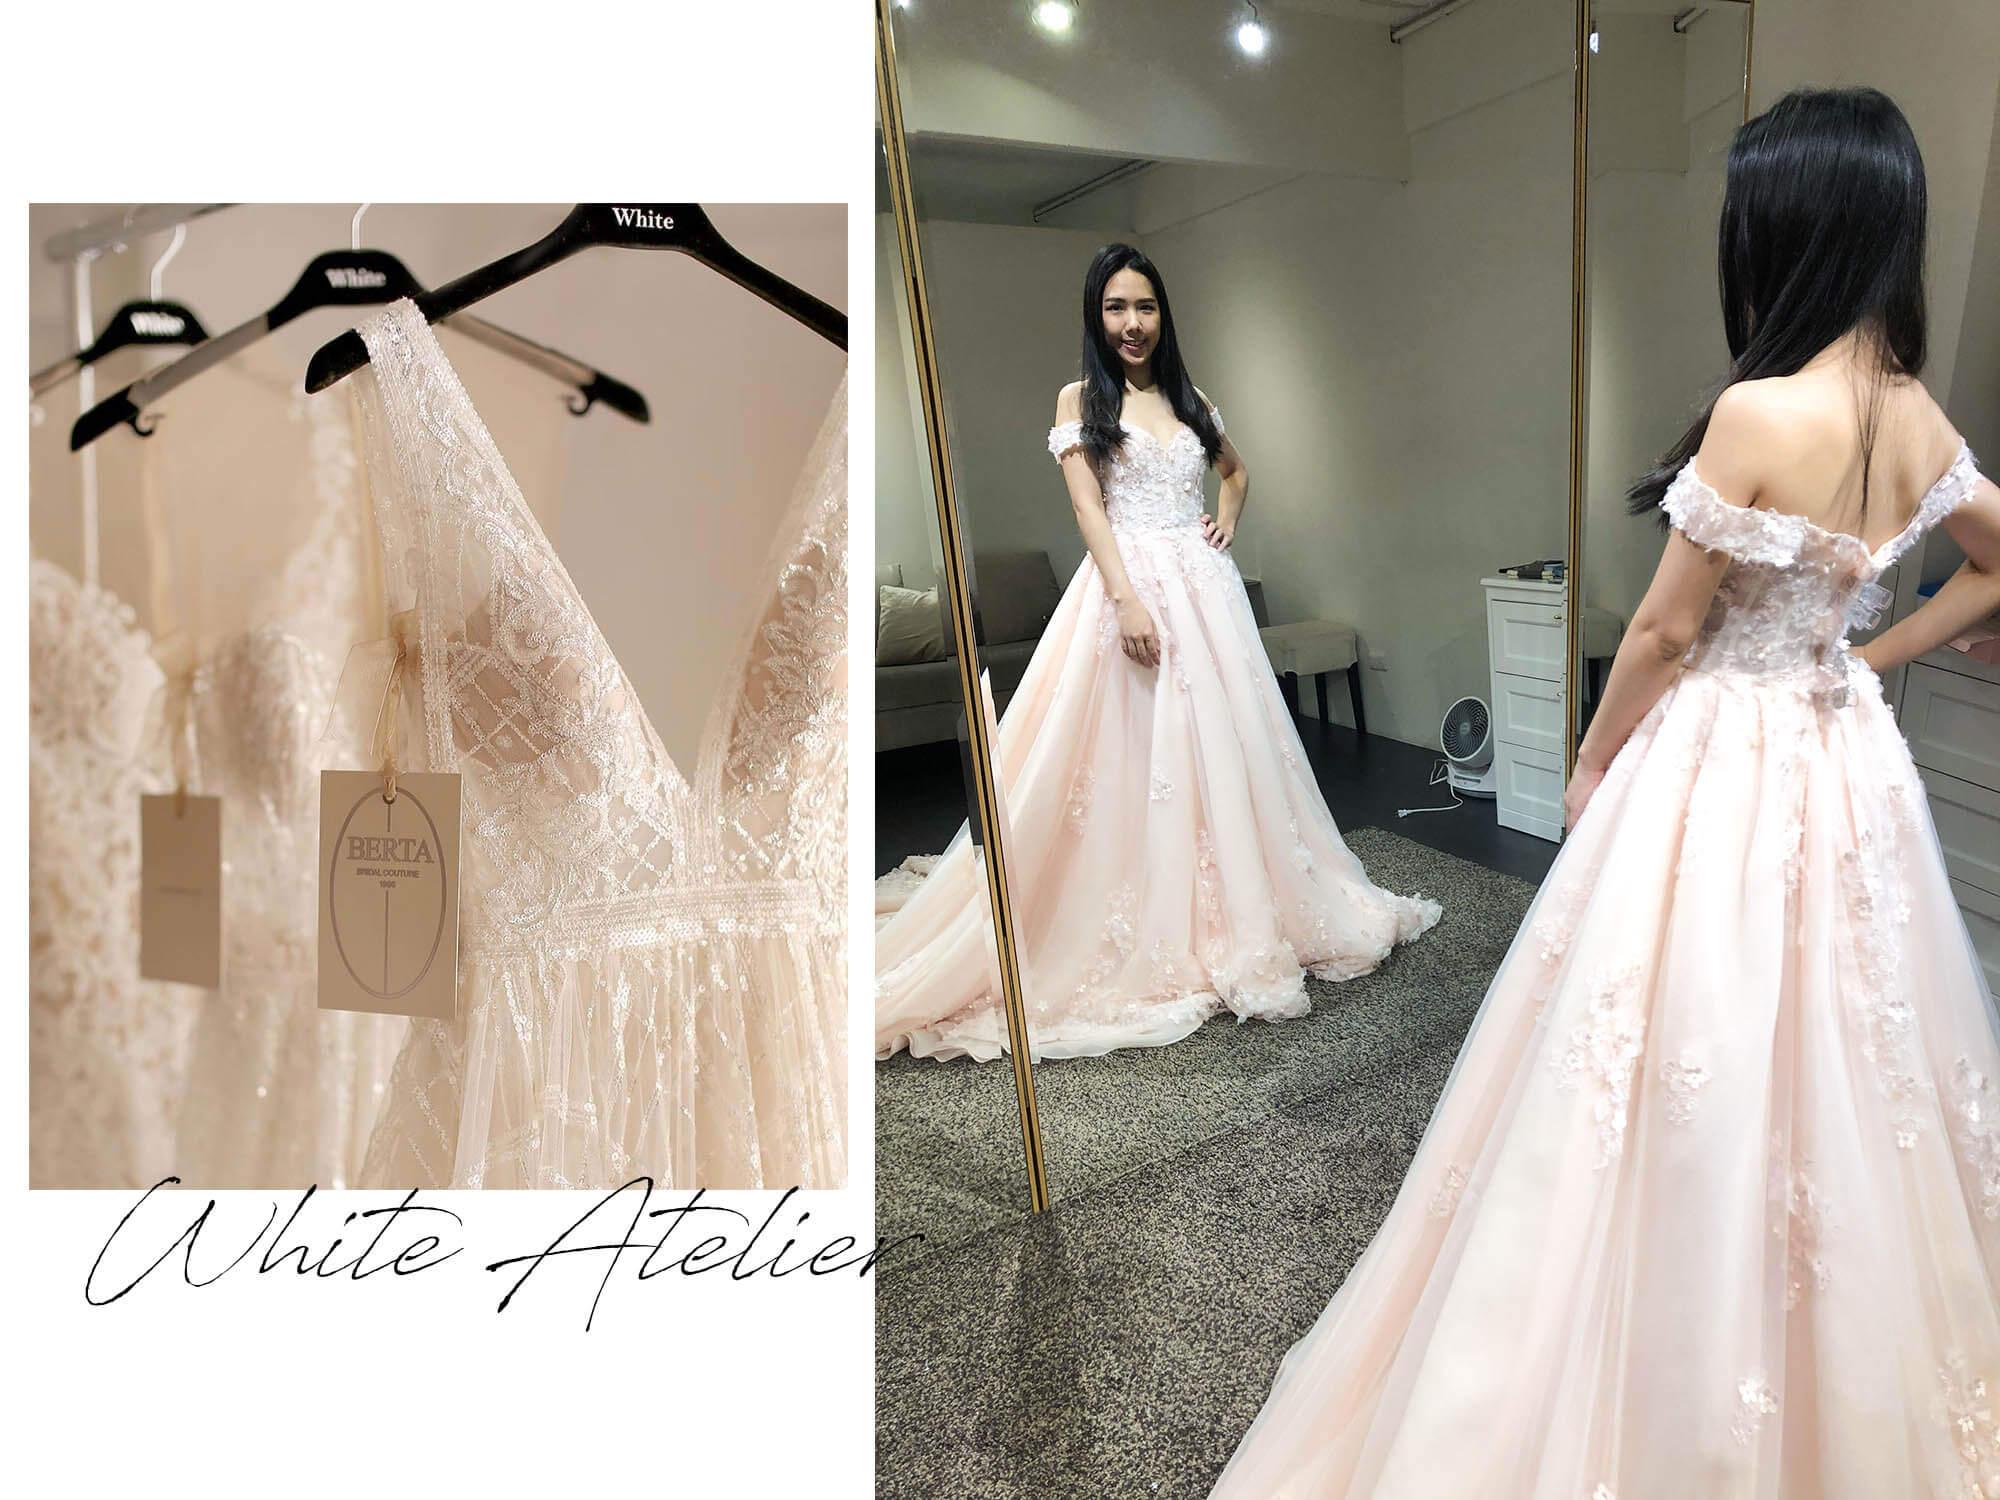 White Atelier手工婚紗|紅毯女星禮服原來都在這挑!訂結婚禮服&白紗試穿諮詢